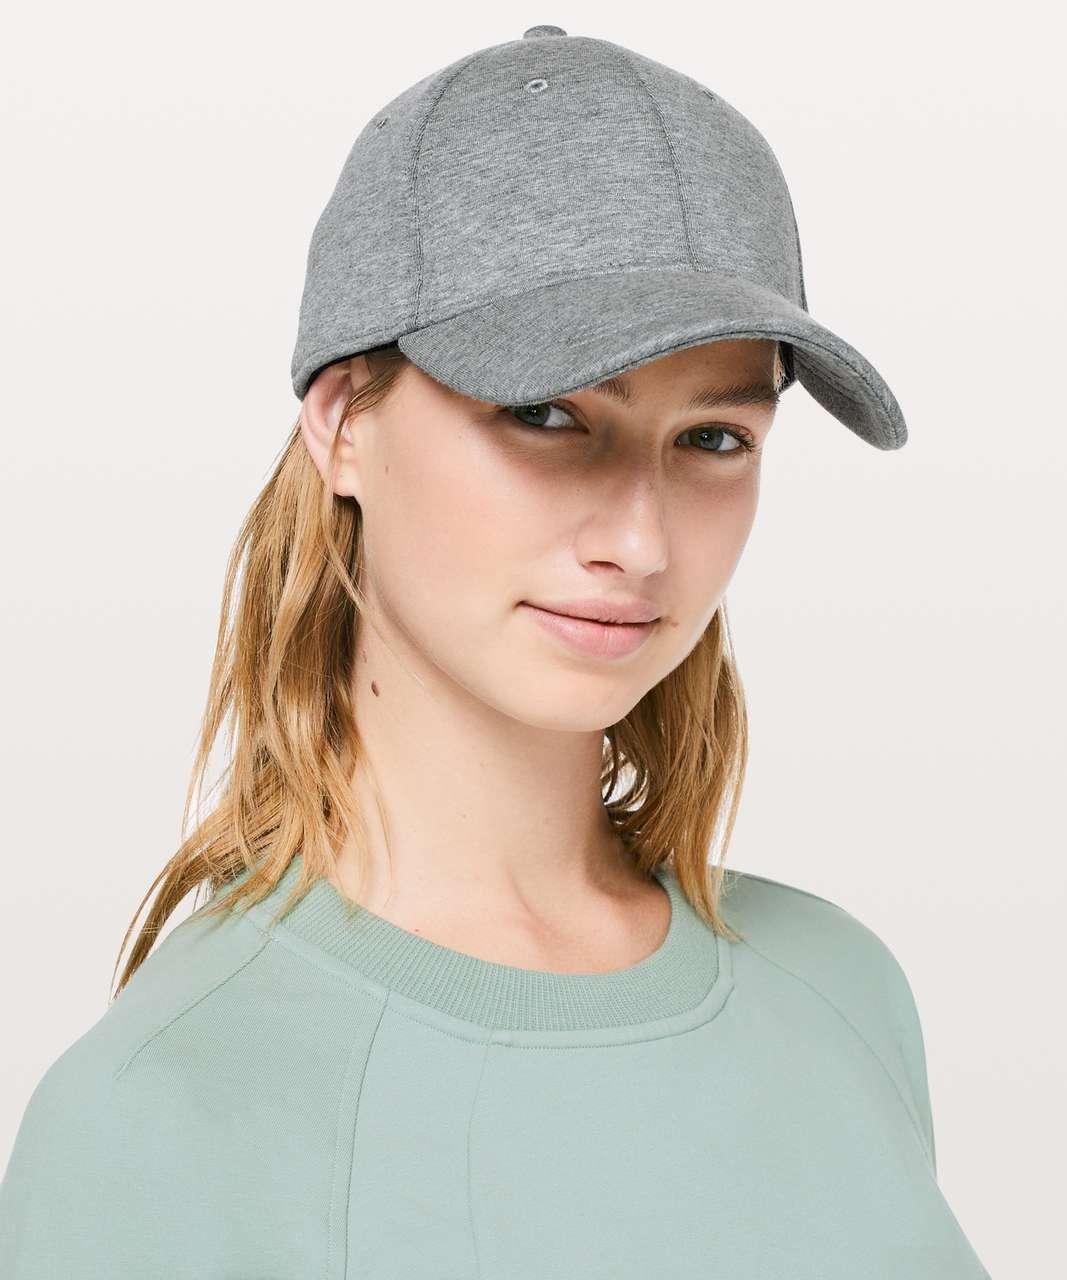 9dae9f09 Lululemon Baller Hat - Heathered Medium Grey / Black - lulu fanatics